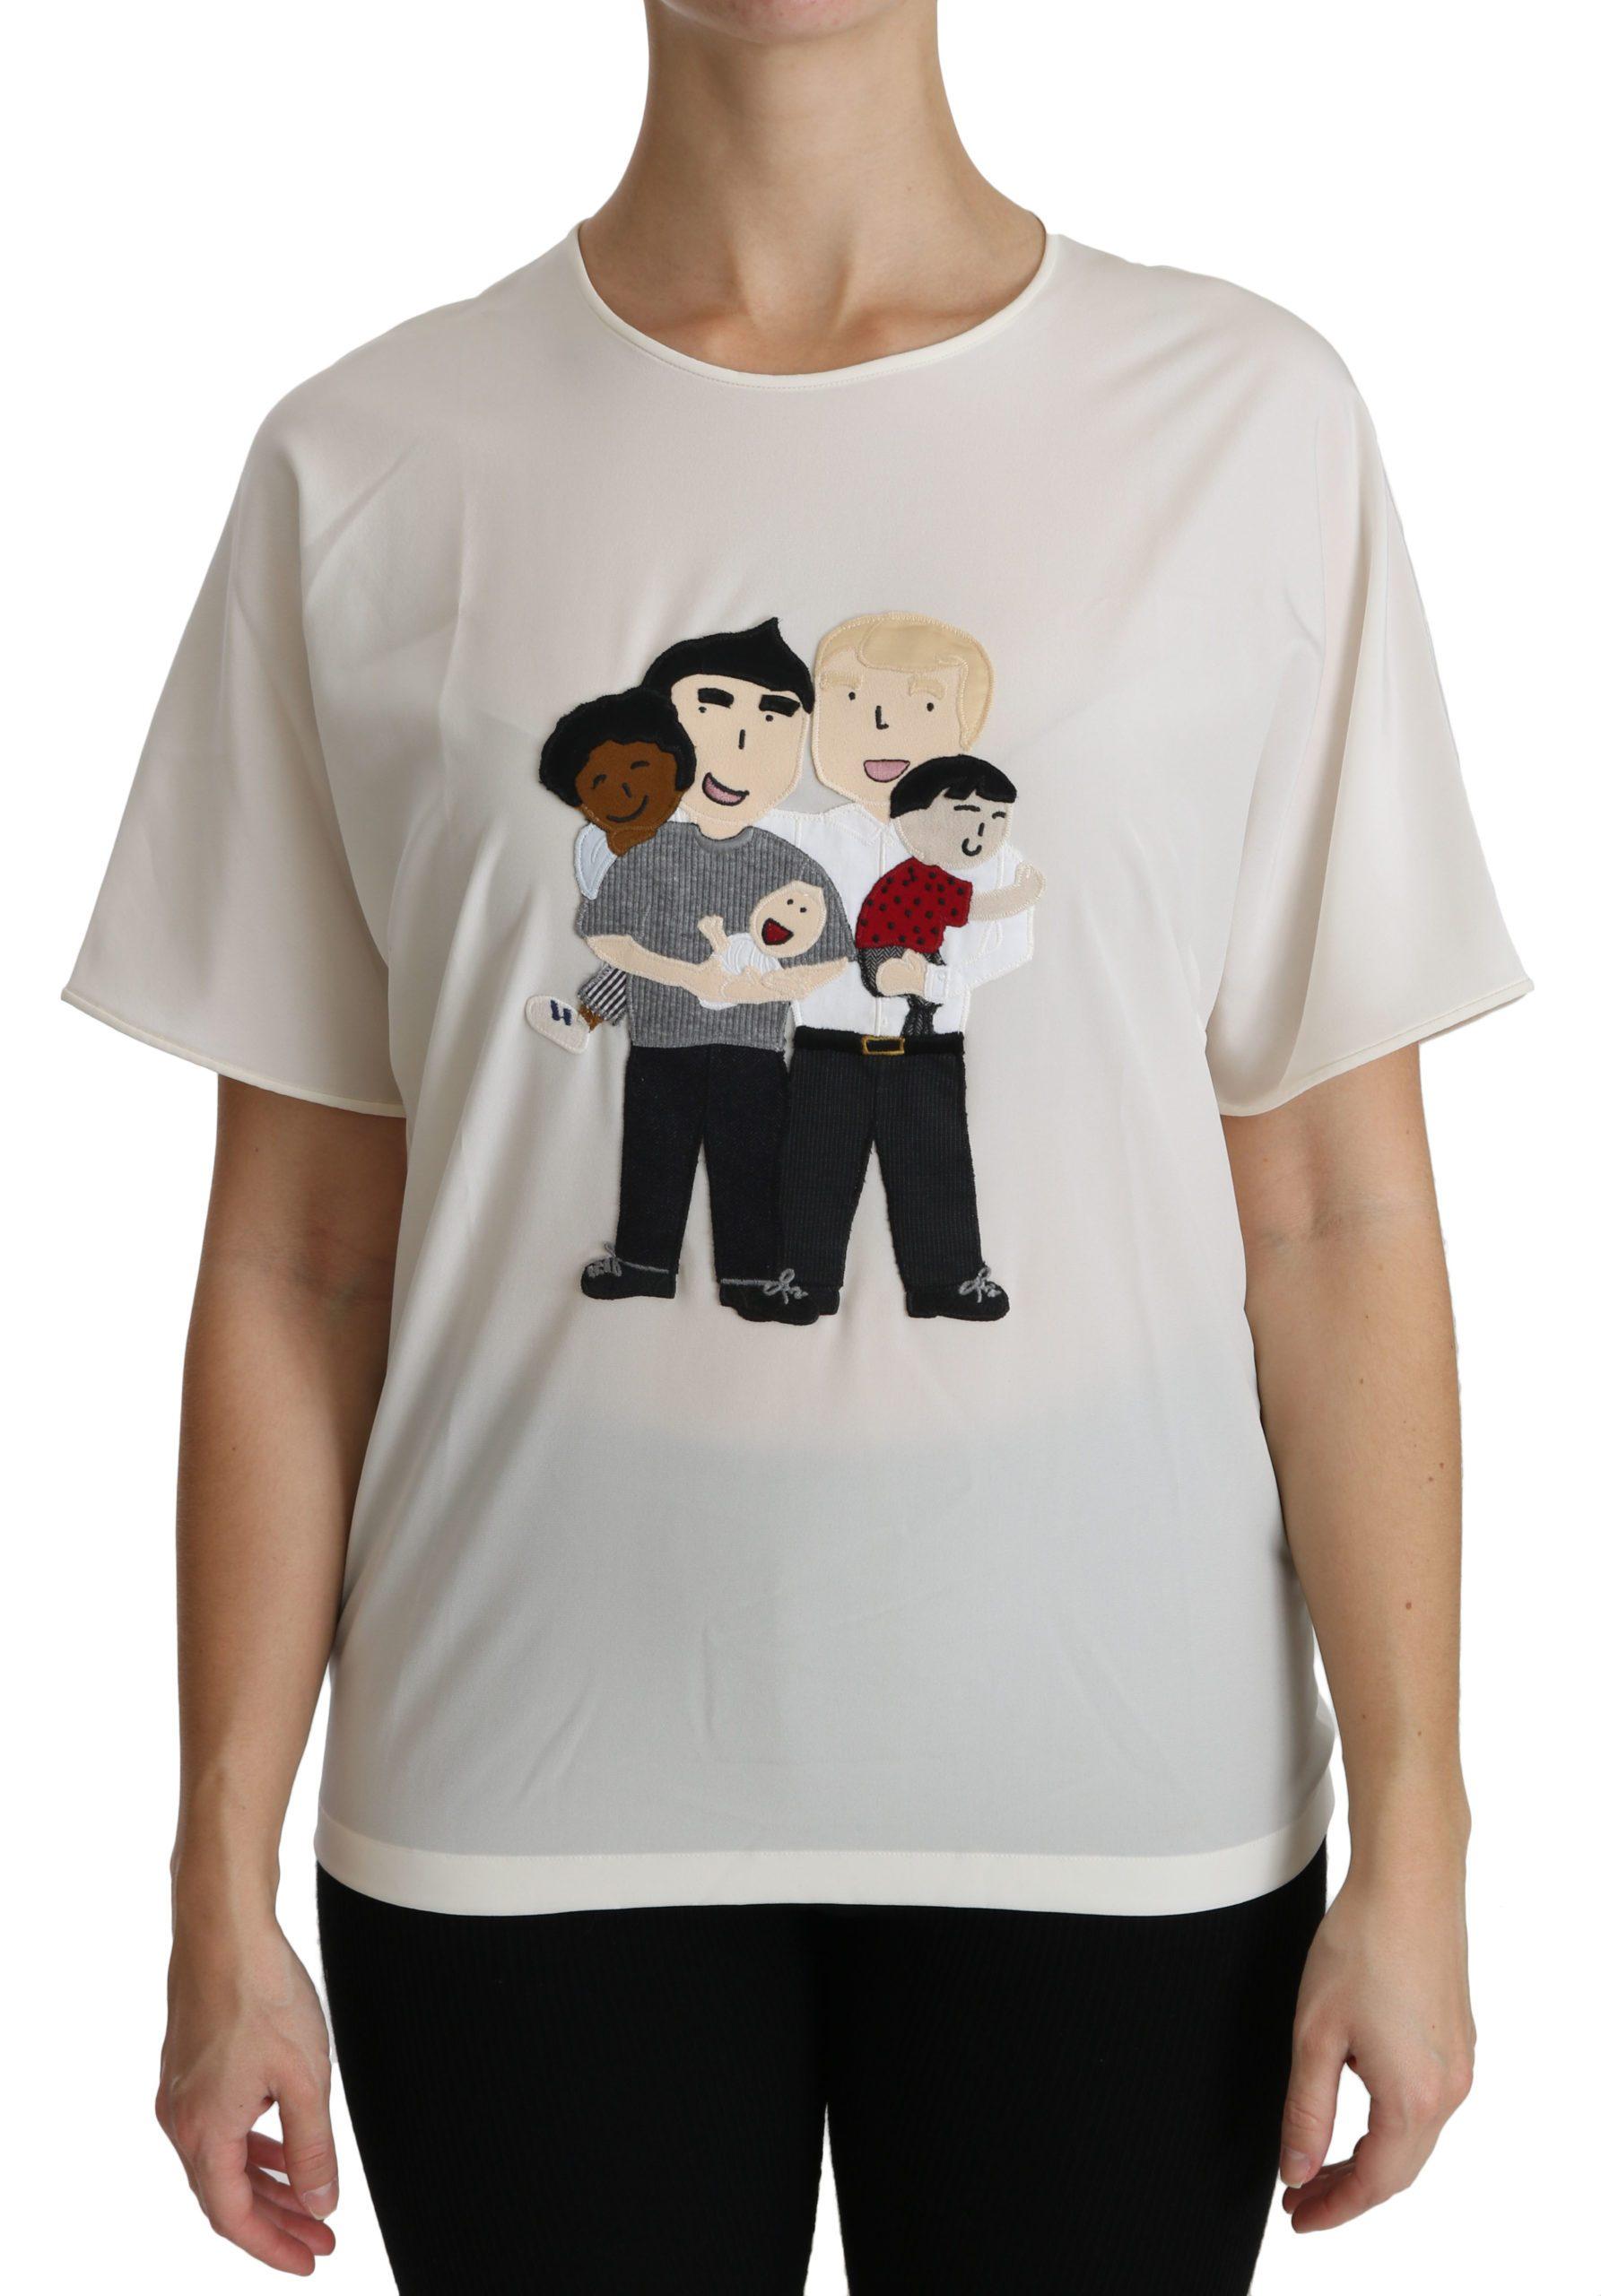 Dolce & Gabbana Women's Patch Short Sleeve T-Shirt White TSH4297 - IT42|M